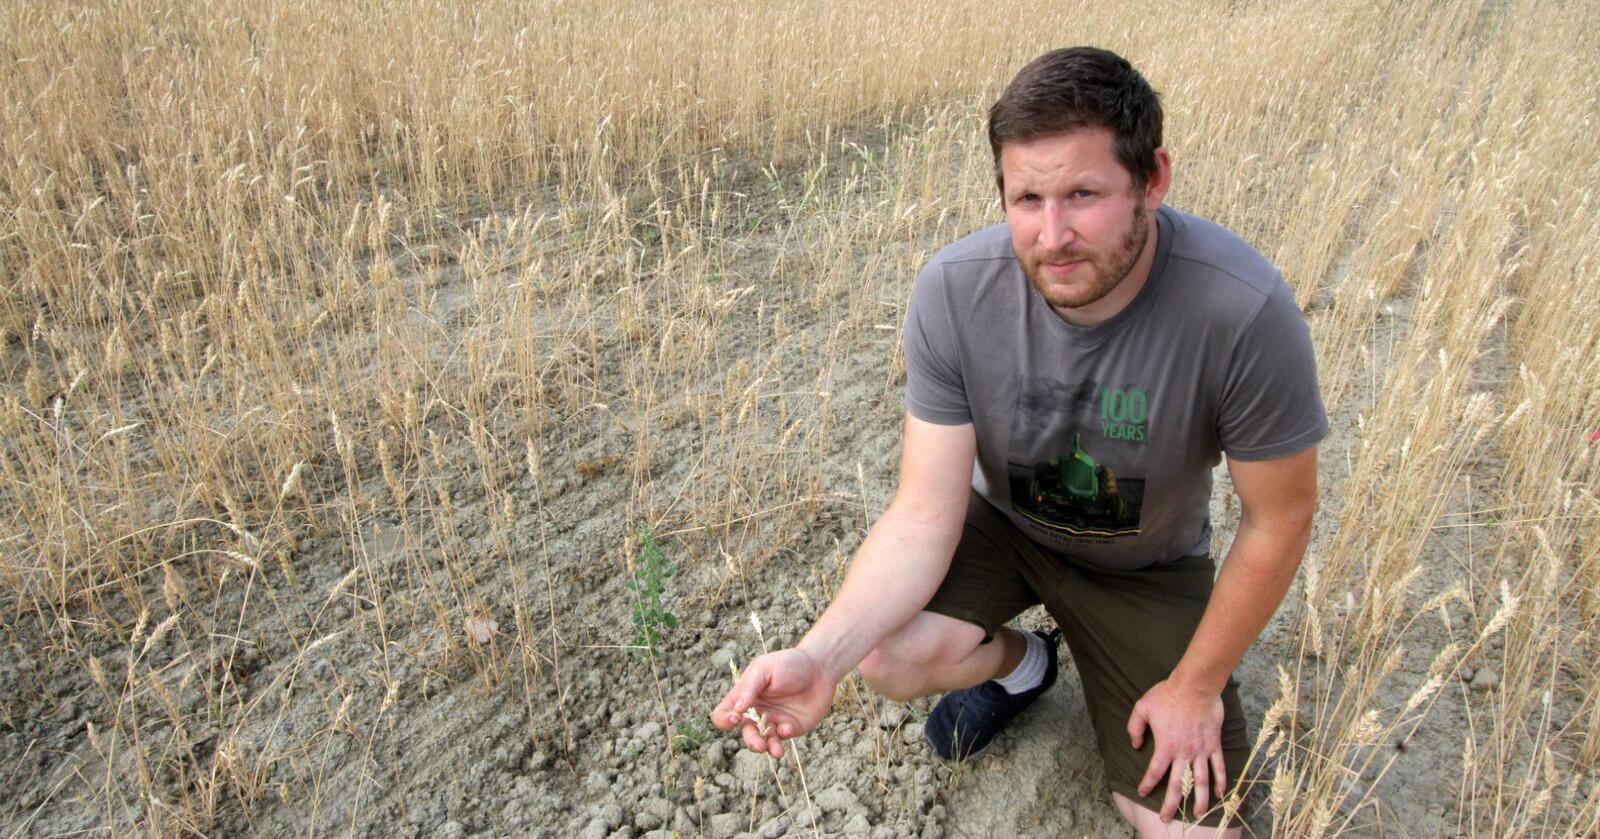 Lågast jordbruksinntekt hadde korn med negativ inntekt på minus 84000 kroner per årsverk. Even Kristian Mangerud på Romerike var ein av mange kornbønder med svært dårlege avlingar i 2018. (Foto: Glen Widing)